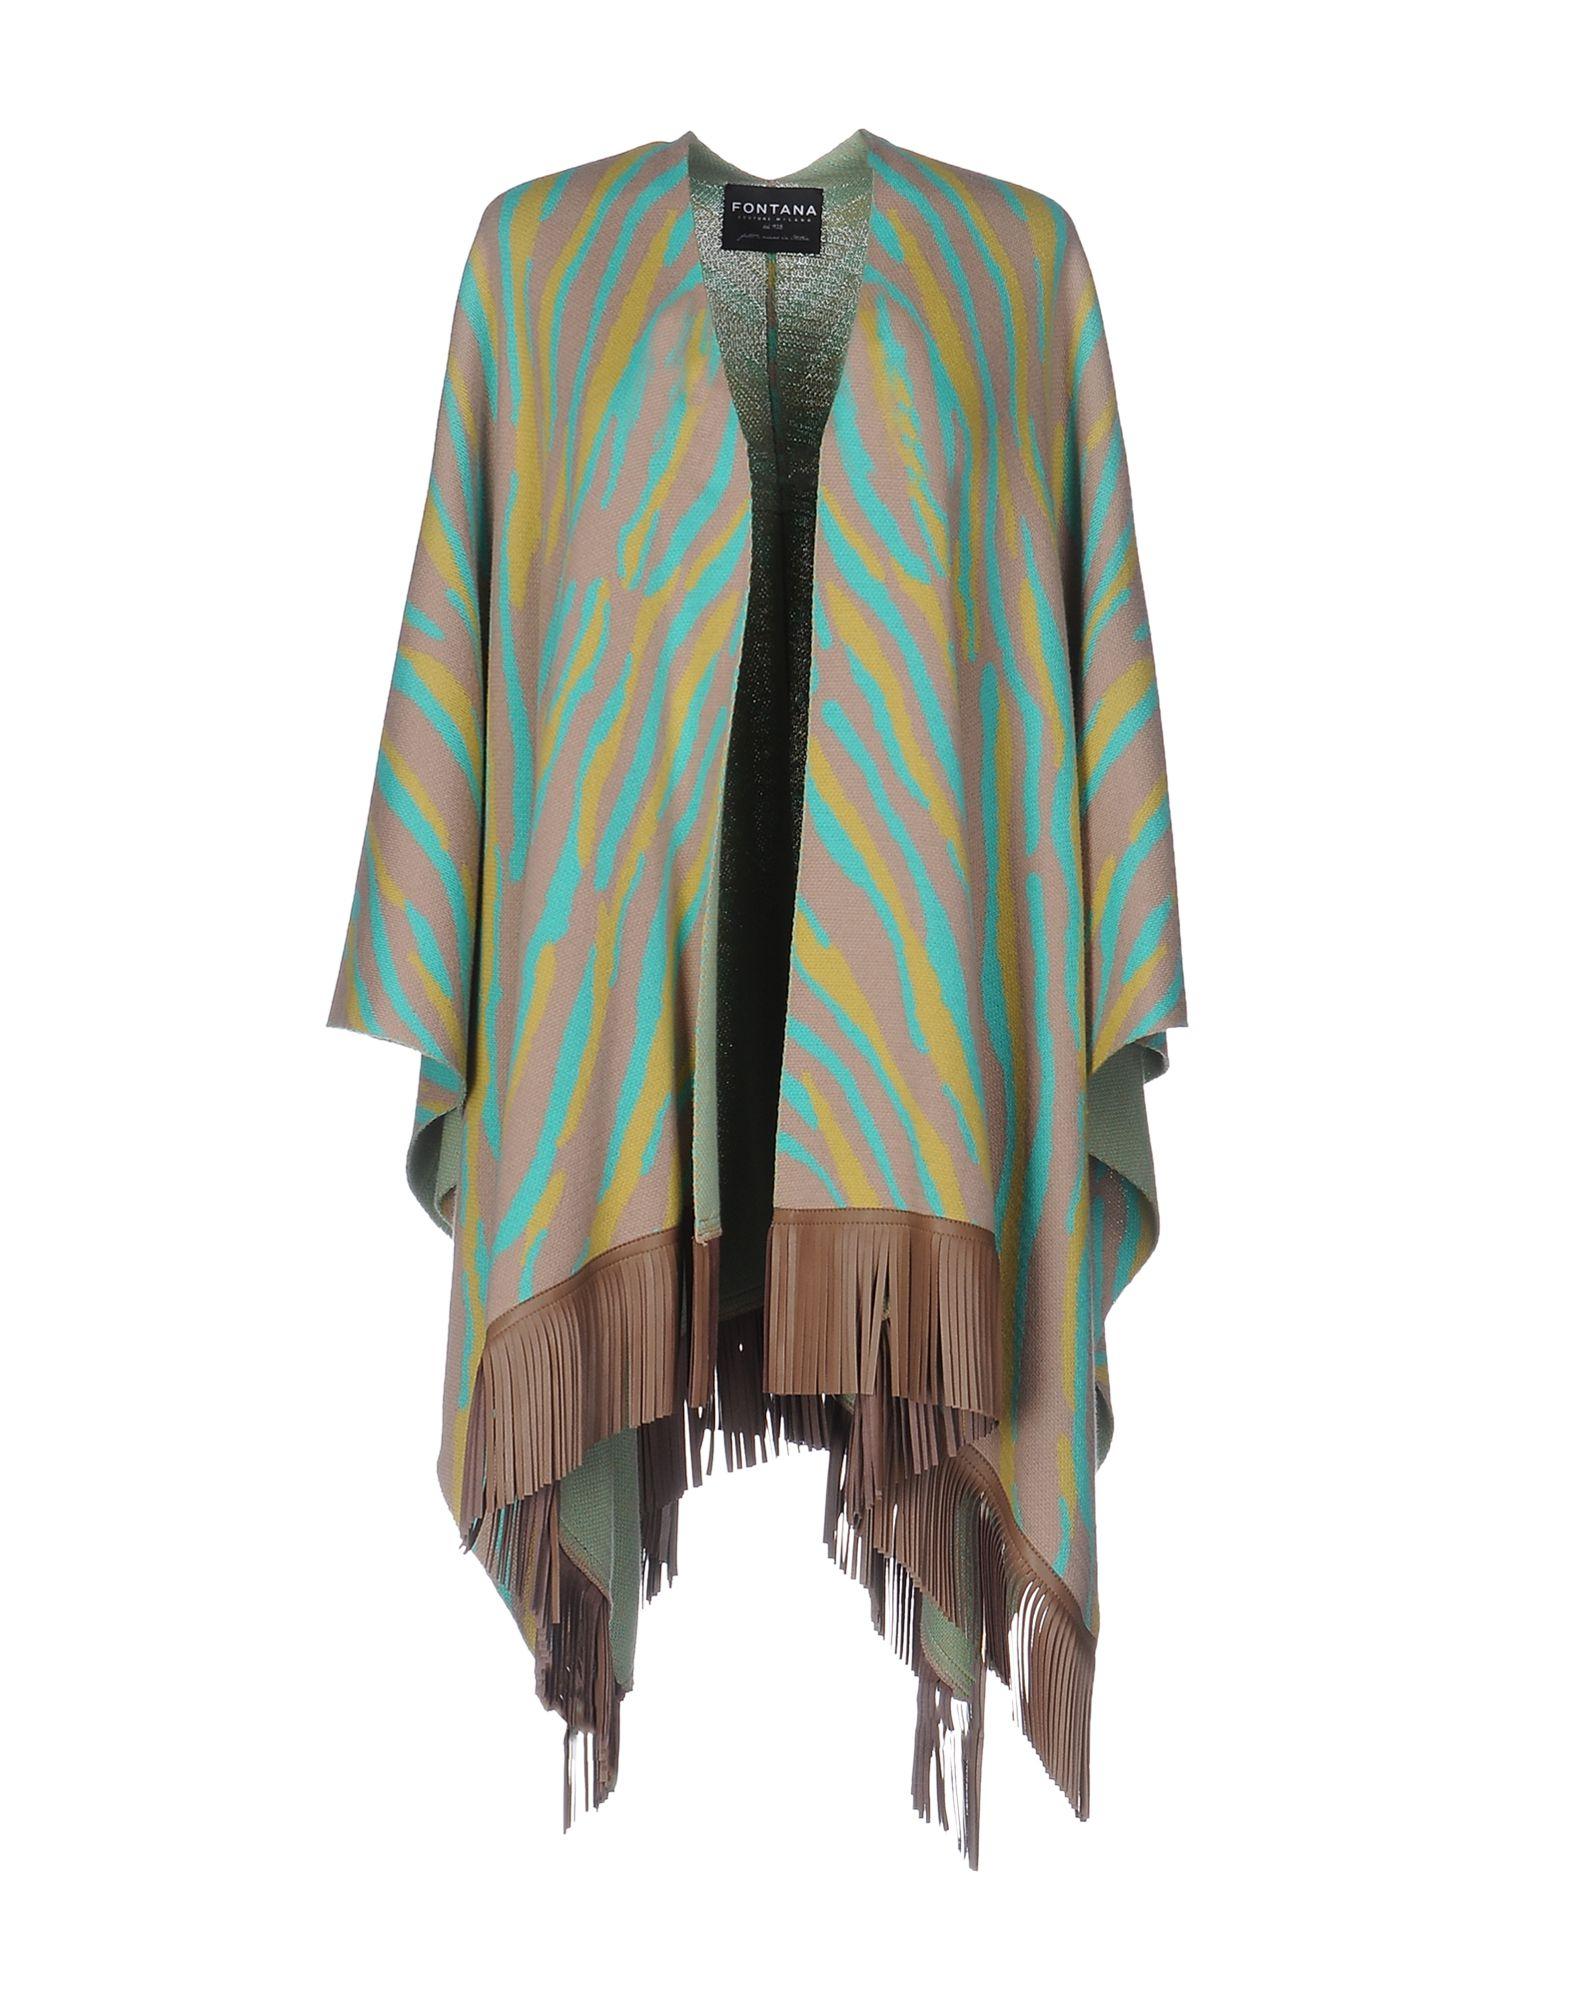 Cappa Fontana Couture Donna - Acquista online su RqnPtDszR